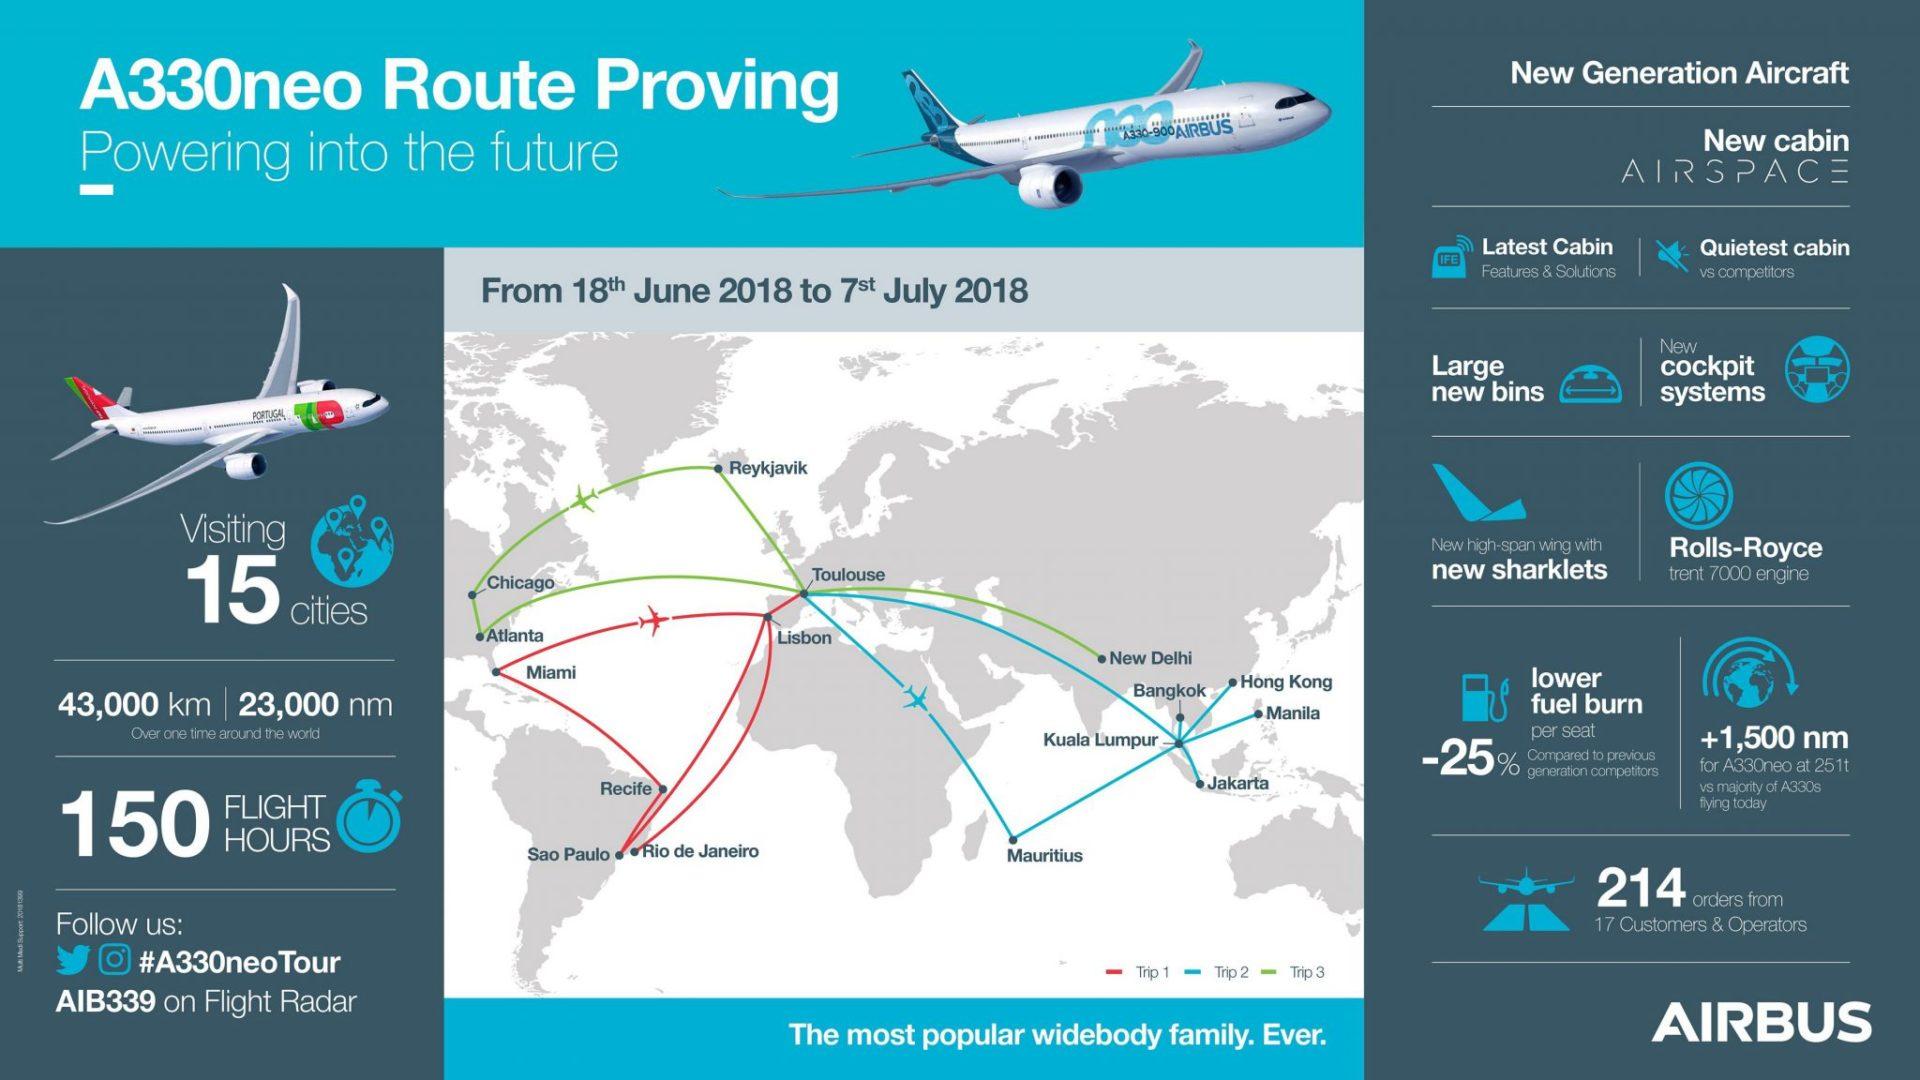 A330neo World Tour (Image: Airbus)